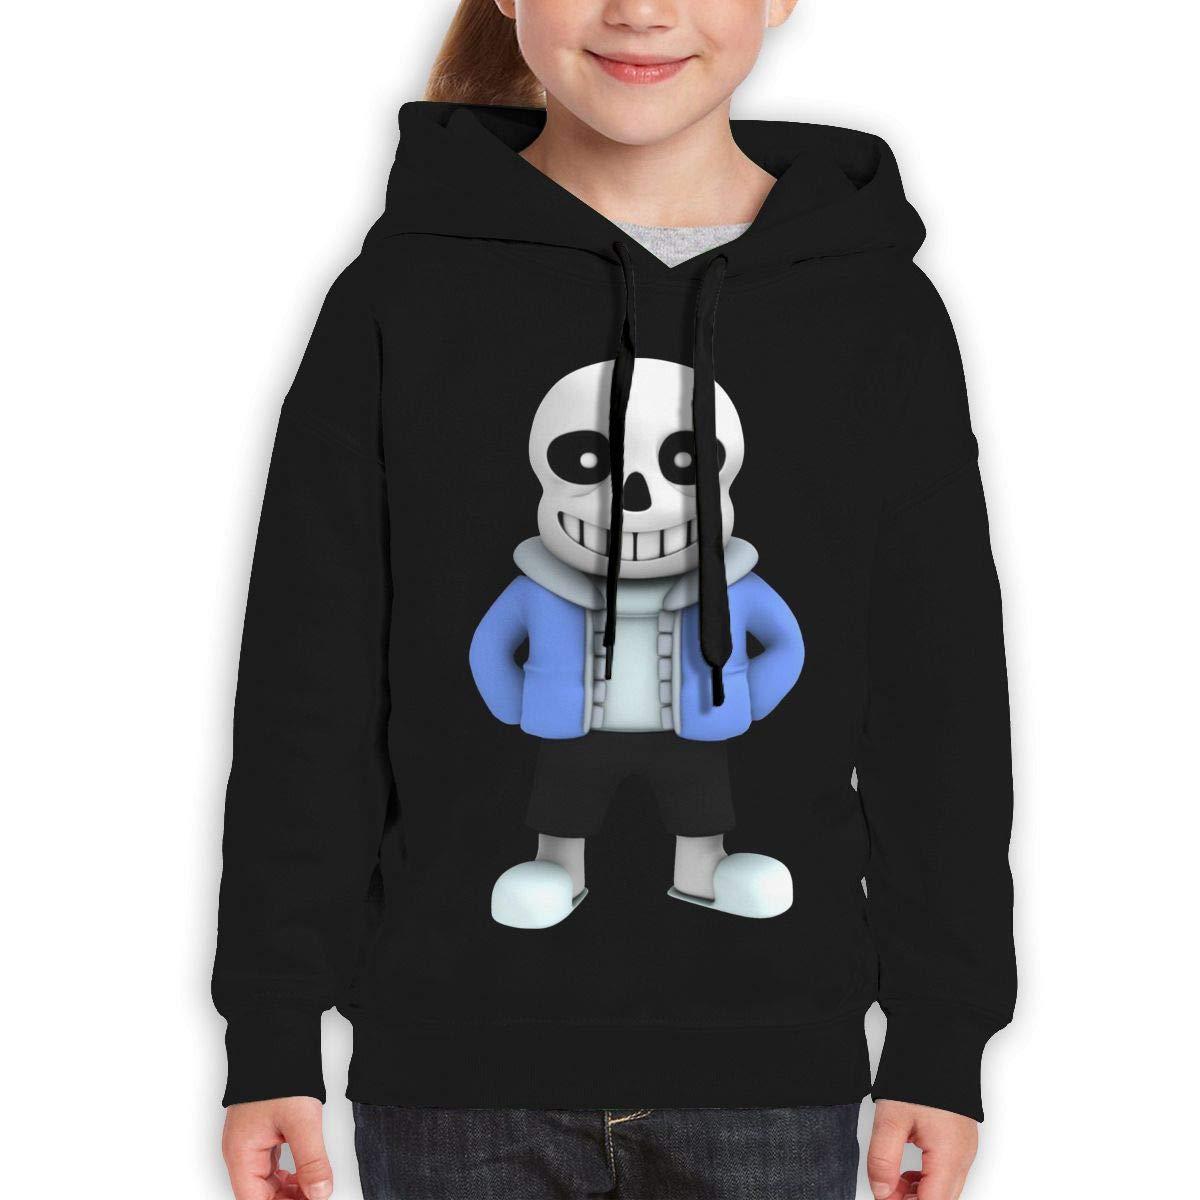 Guiping Undertale1 Teen Hooded Sweate Sweatshirt Black